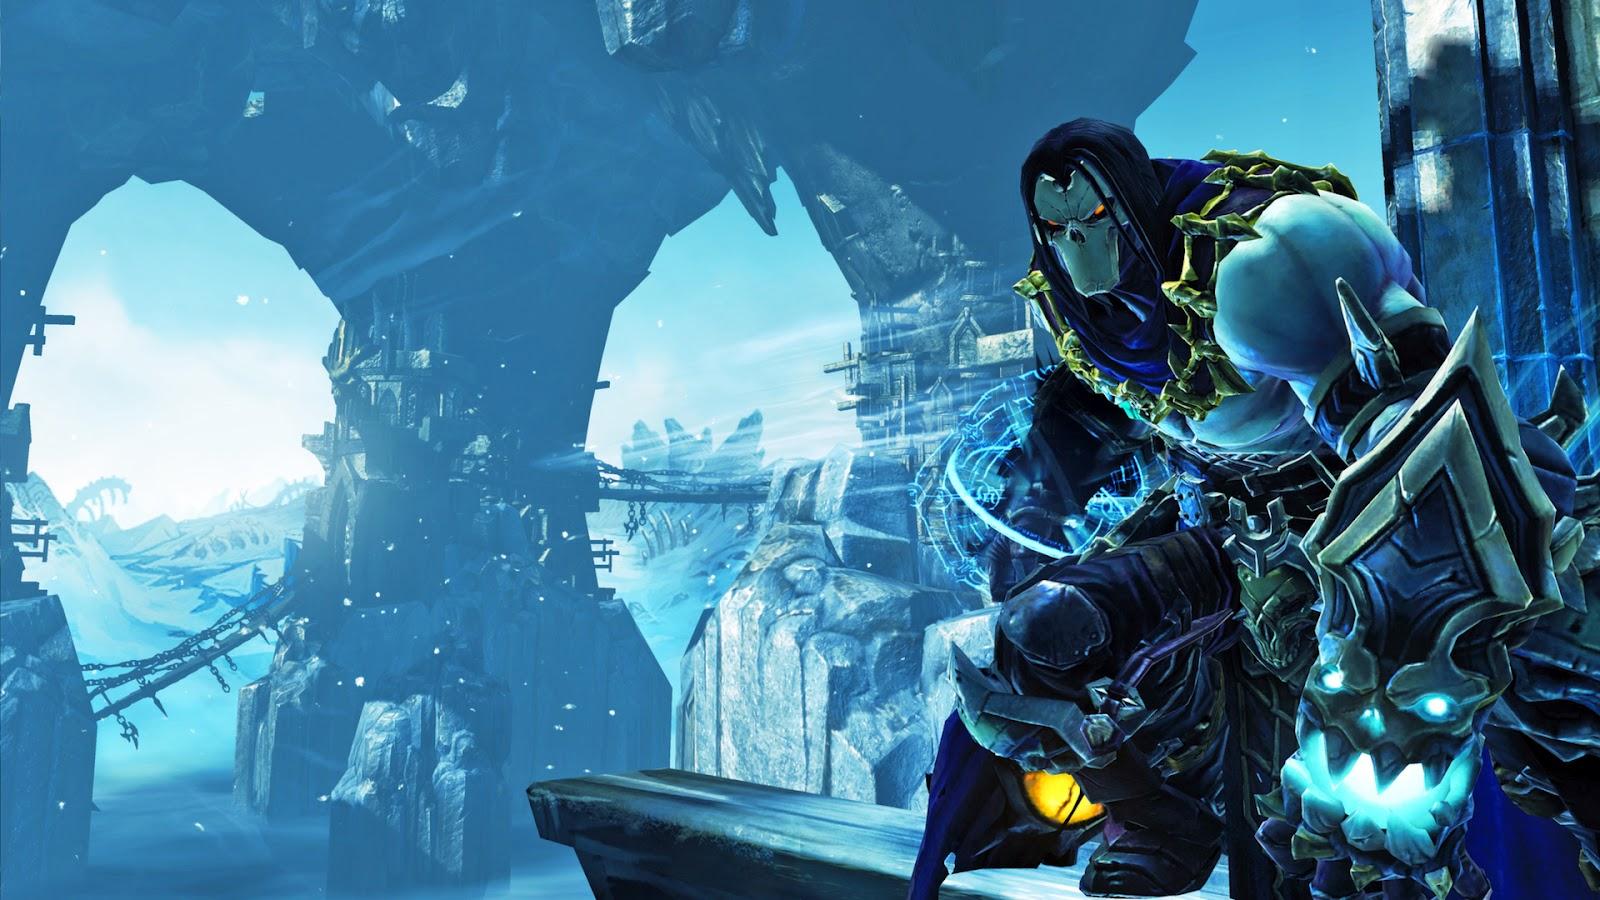 Software games darksiders ii arguls tomb dlc espa ol pc game - Descargar darksiders 2 ...